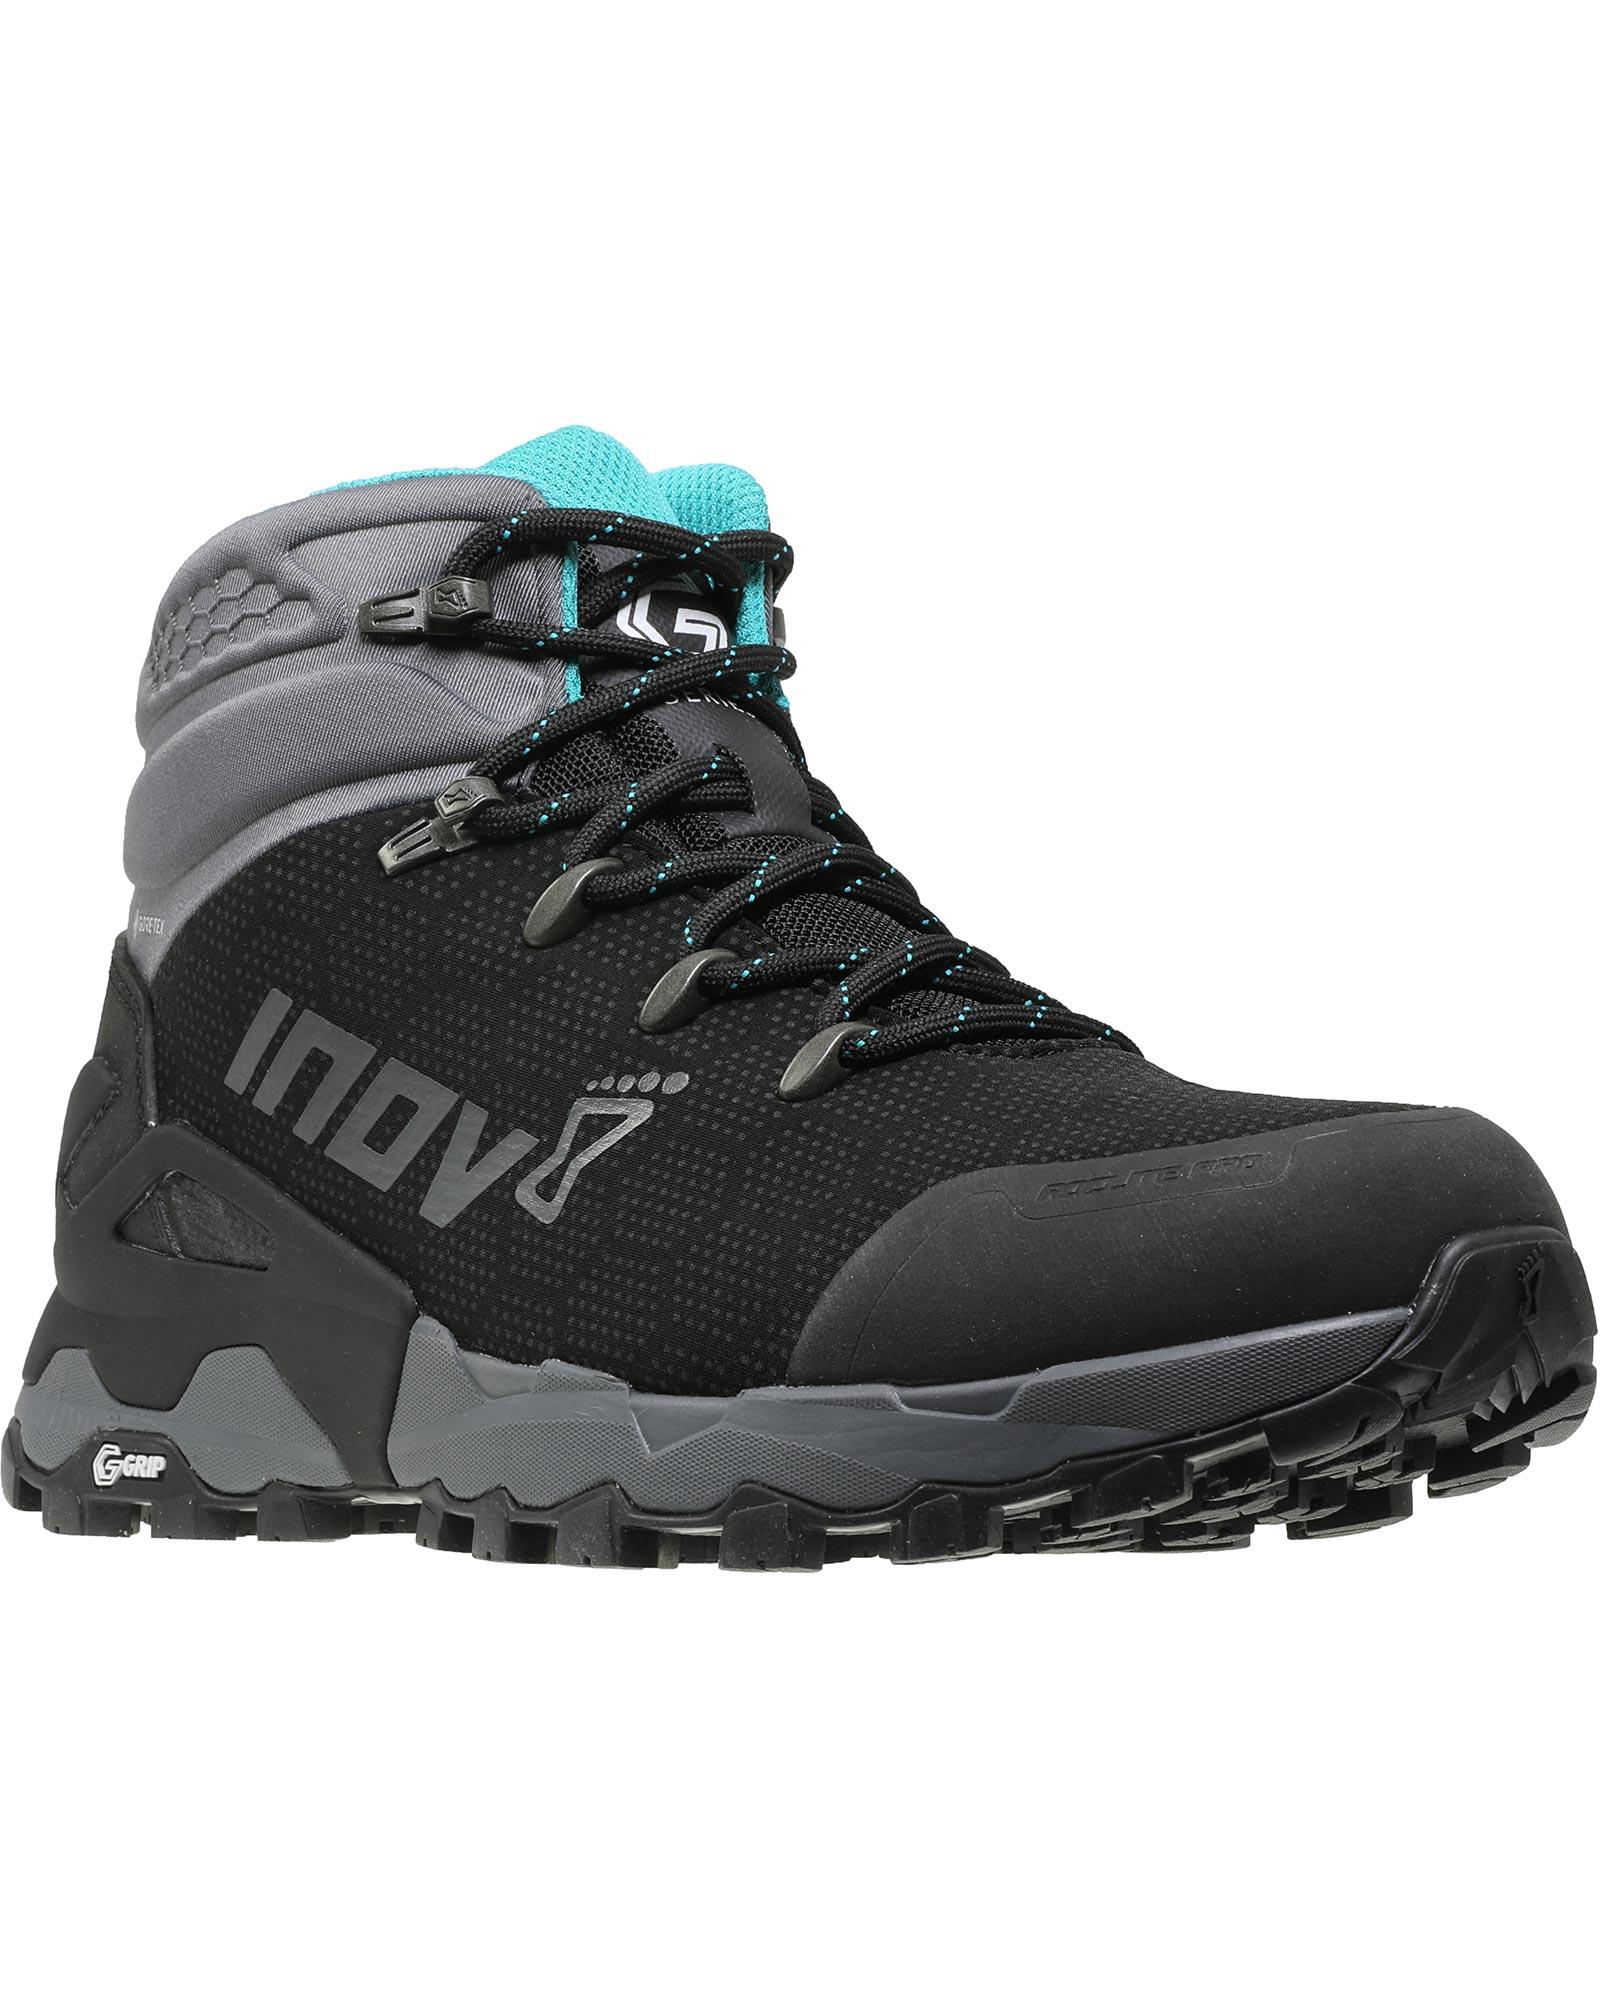 Inov-8 Roclite Pro G 400 GORE-TEX Women's Boots 0